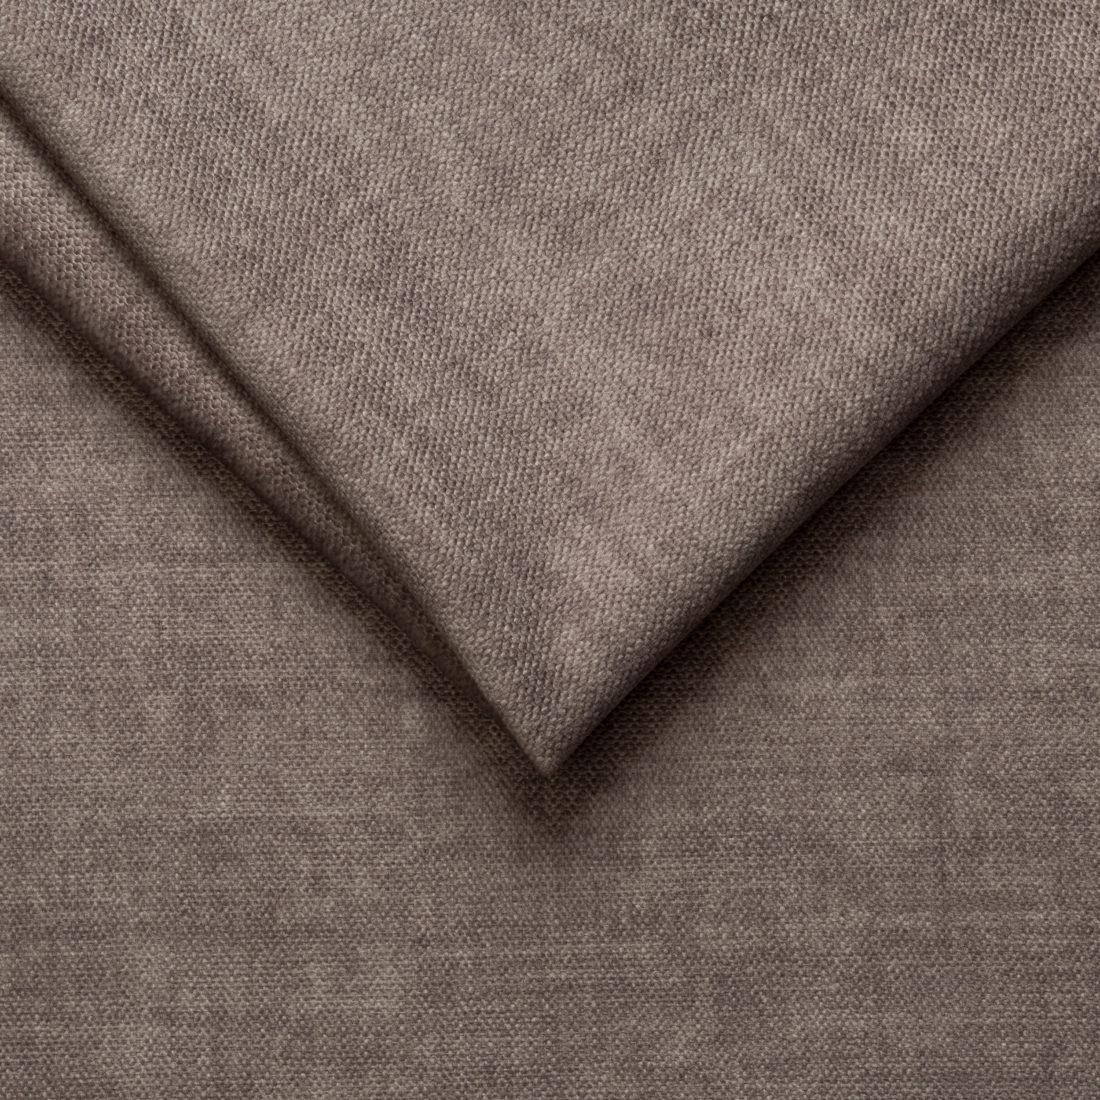 Мебельная ткань Vogue 4 Taupe, велюр